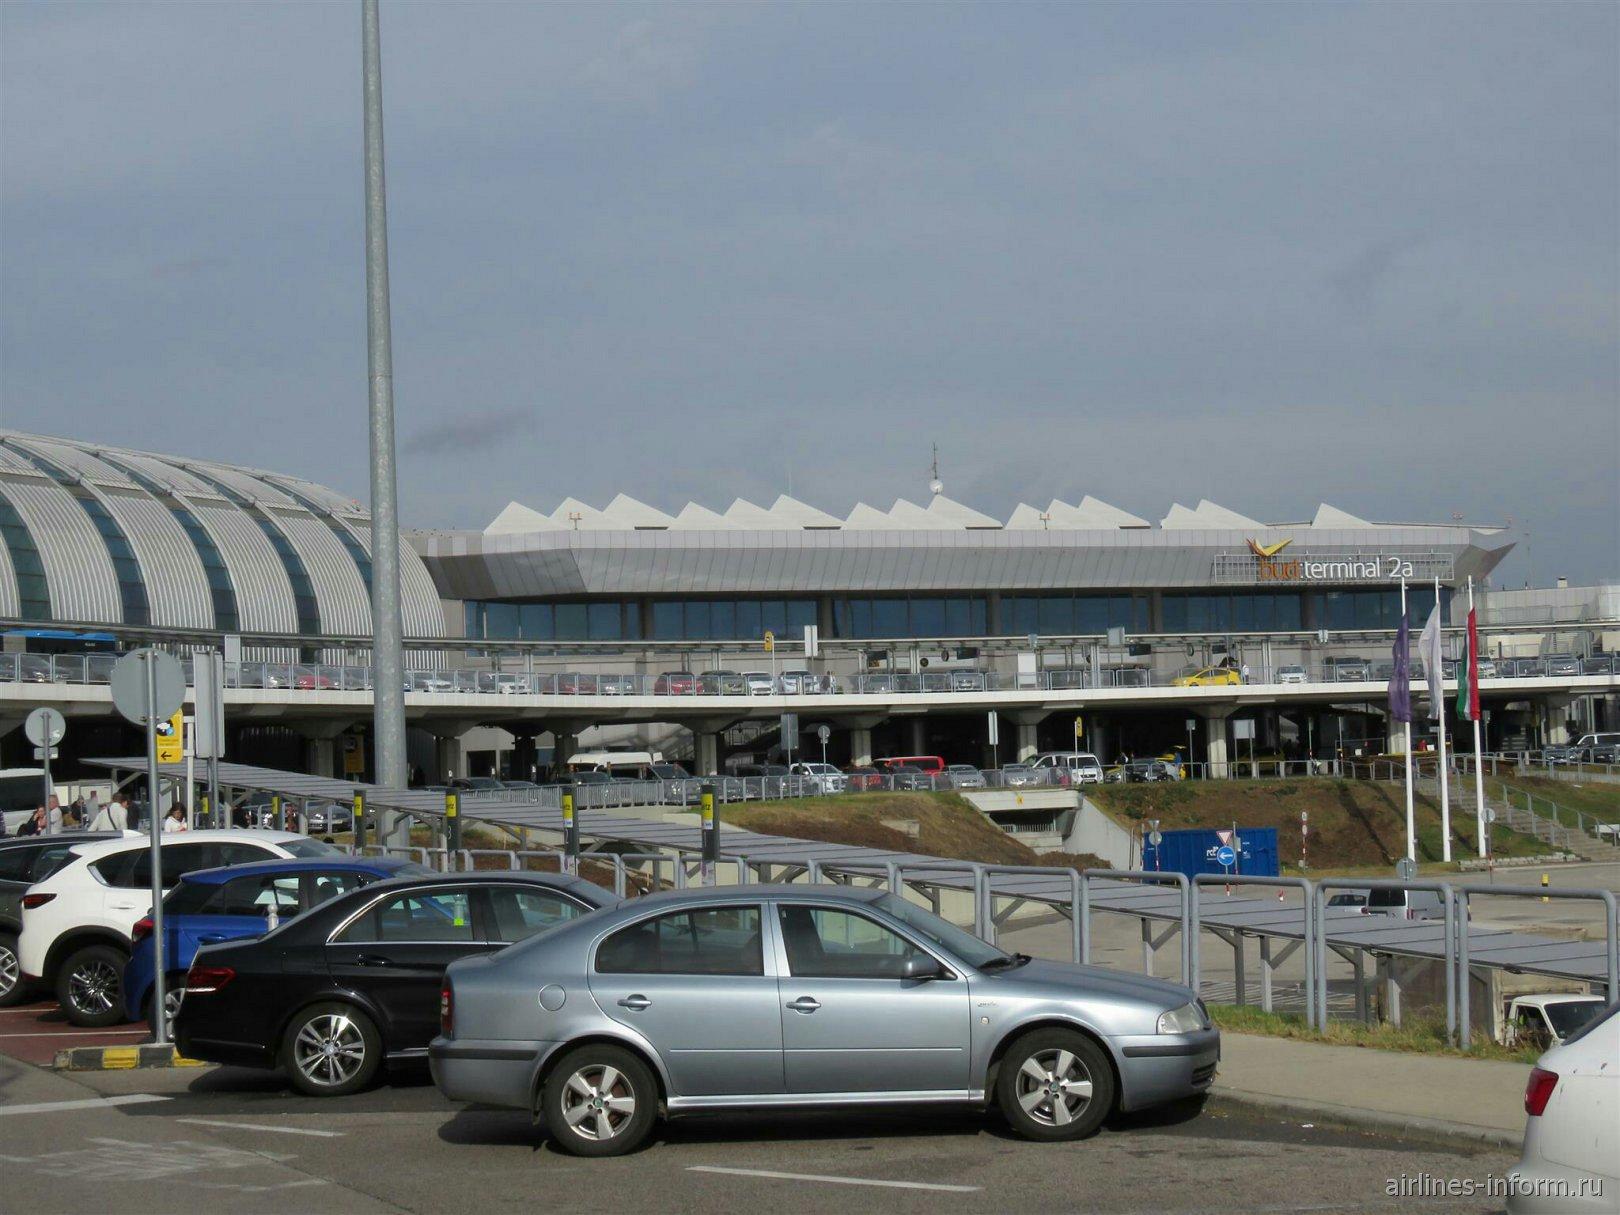 Терминал 2а аэропорта Будапешт имени Ференца Листа